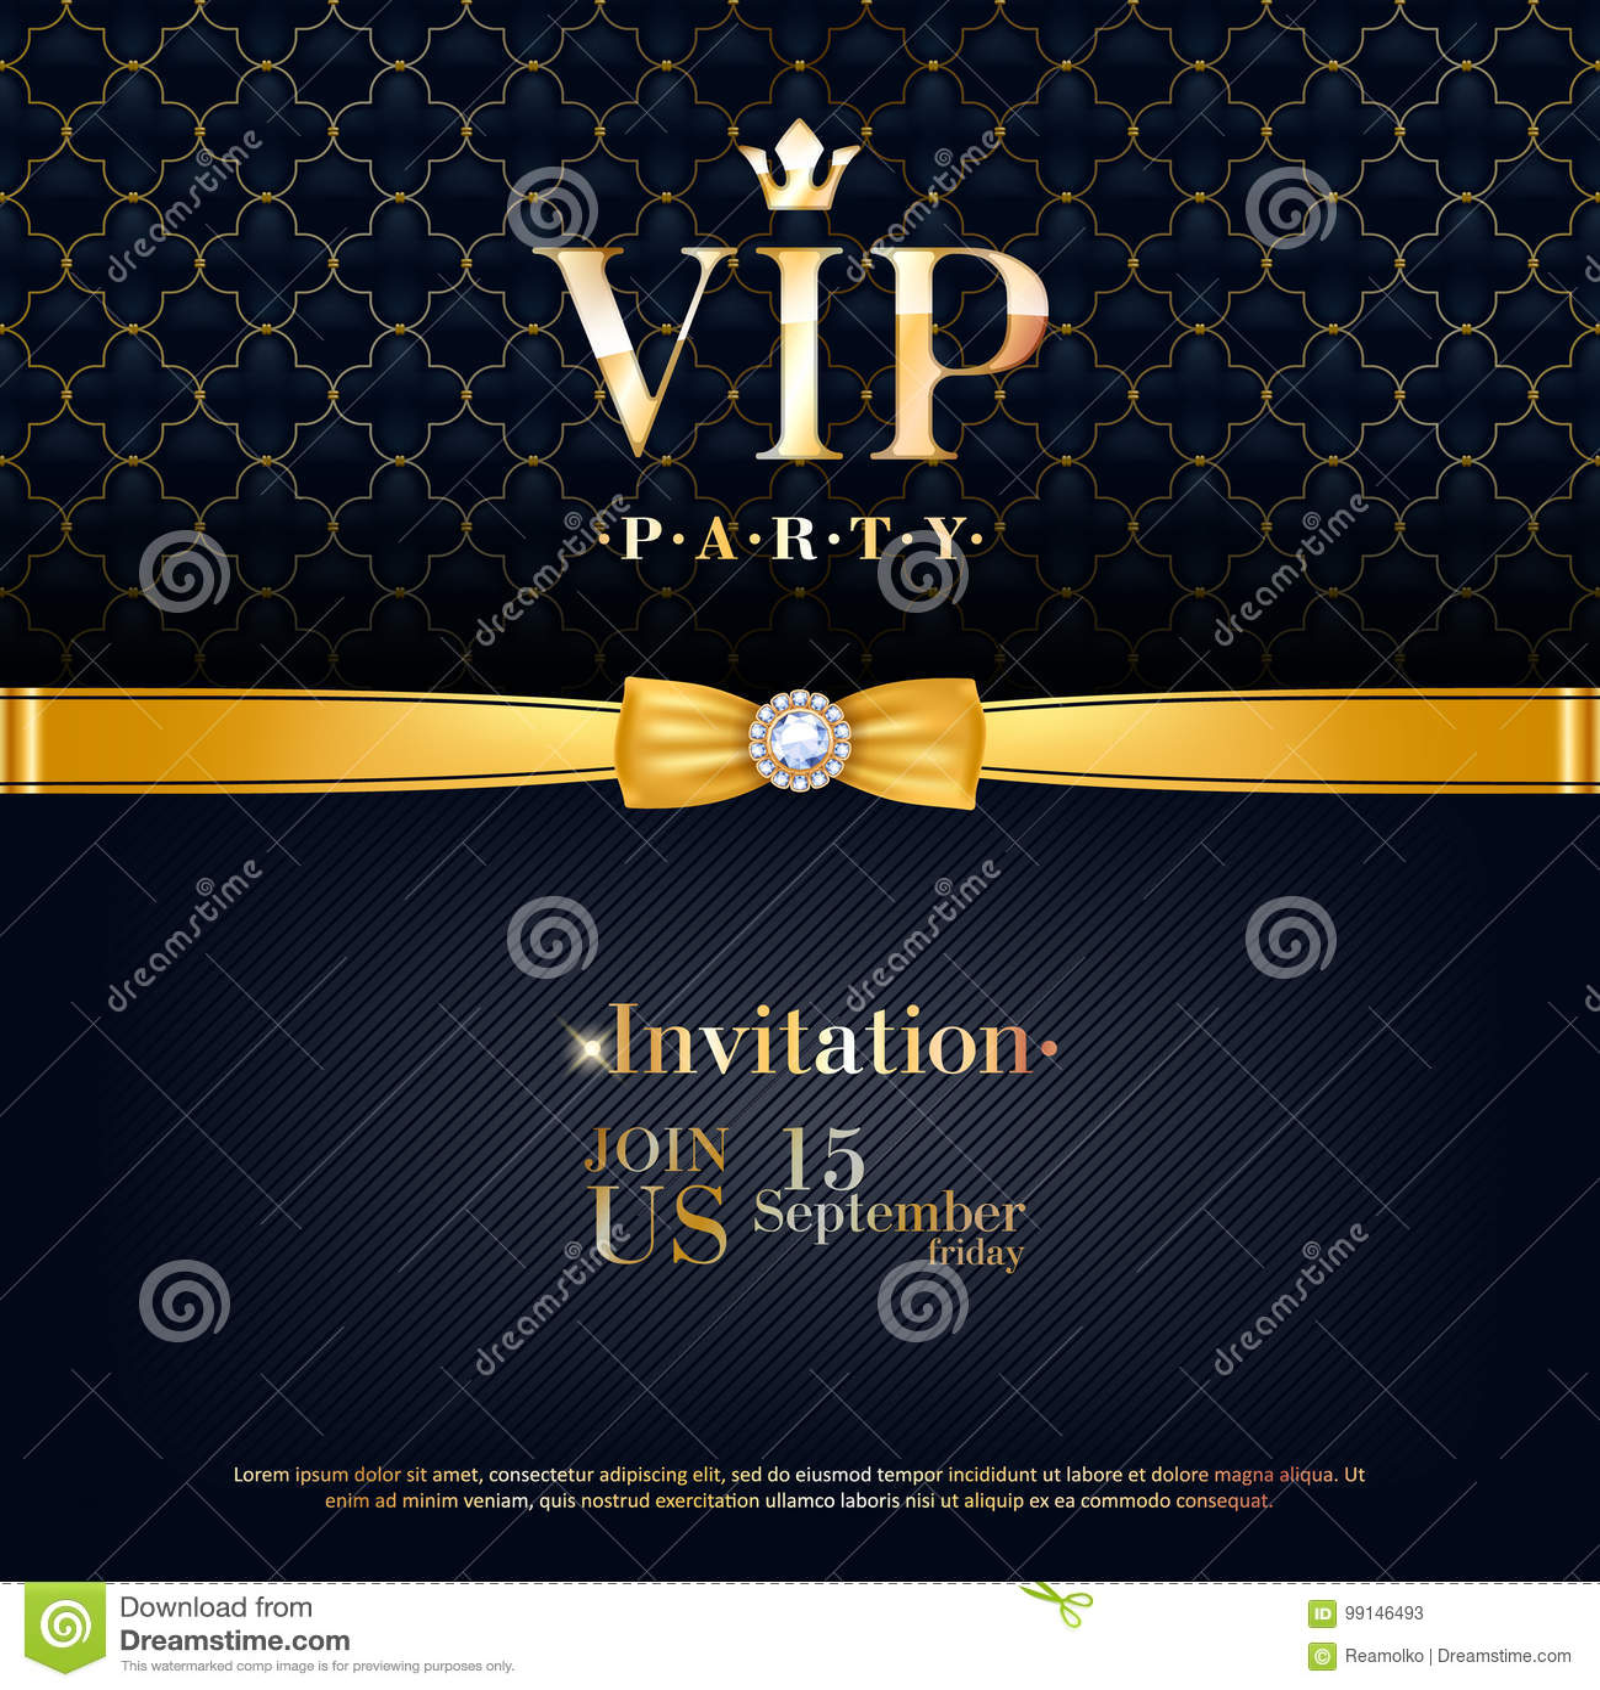 VIP Invitation Premium Design Background Template. Stock Vector ...